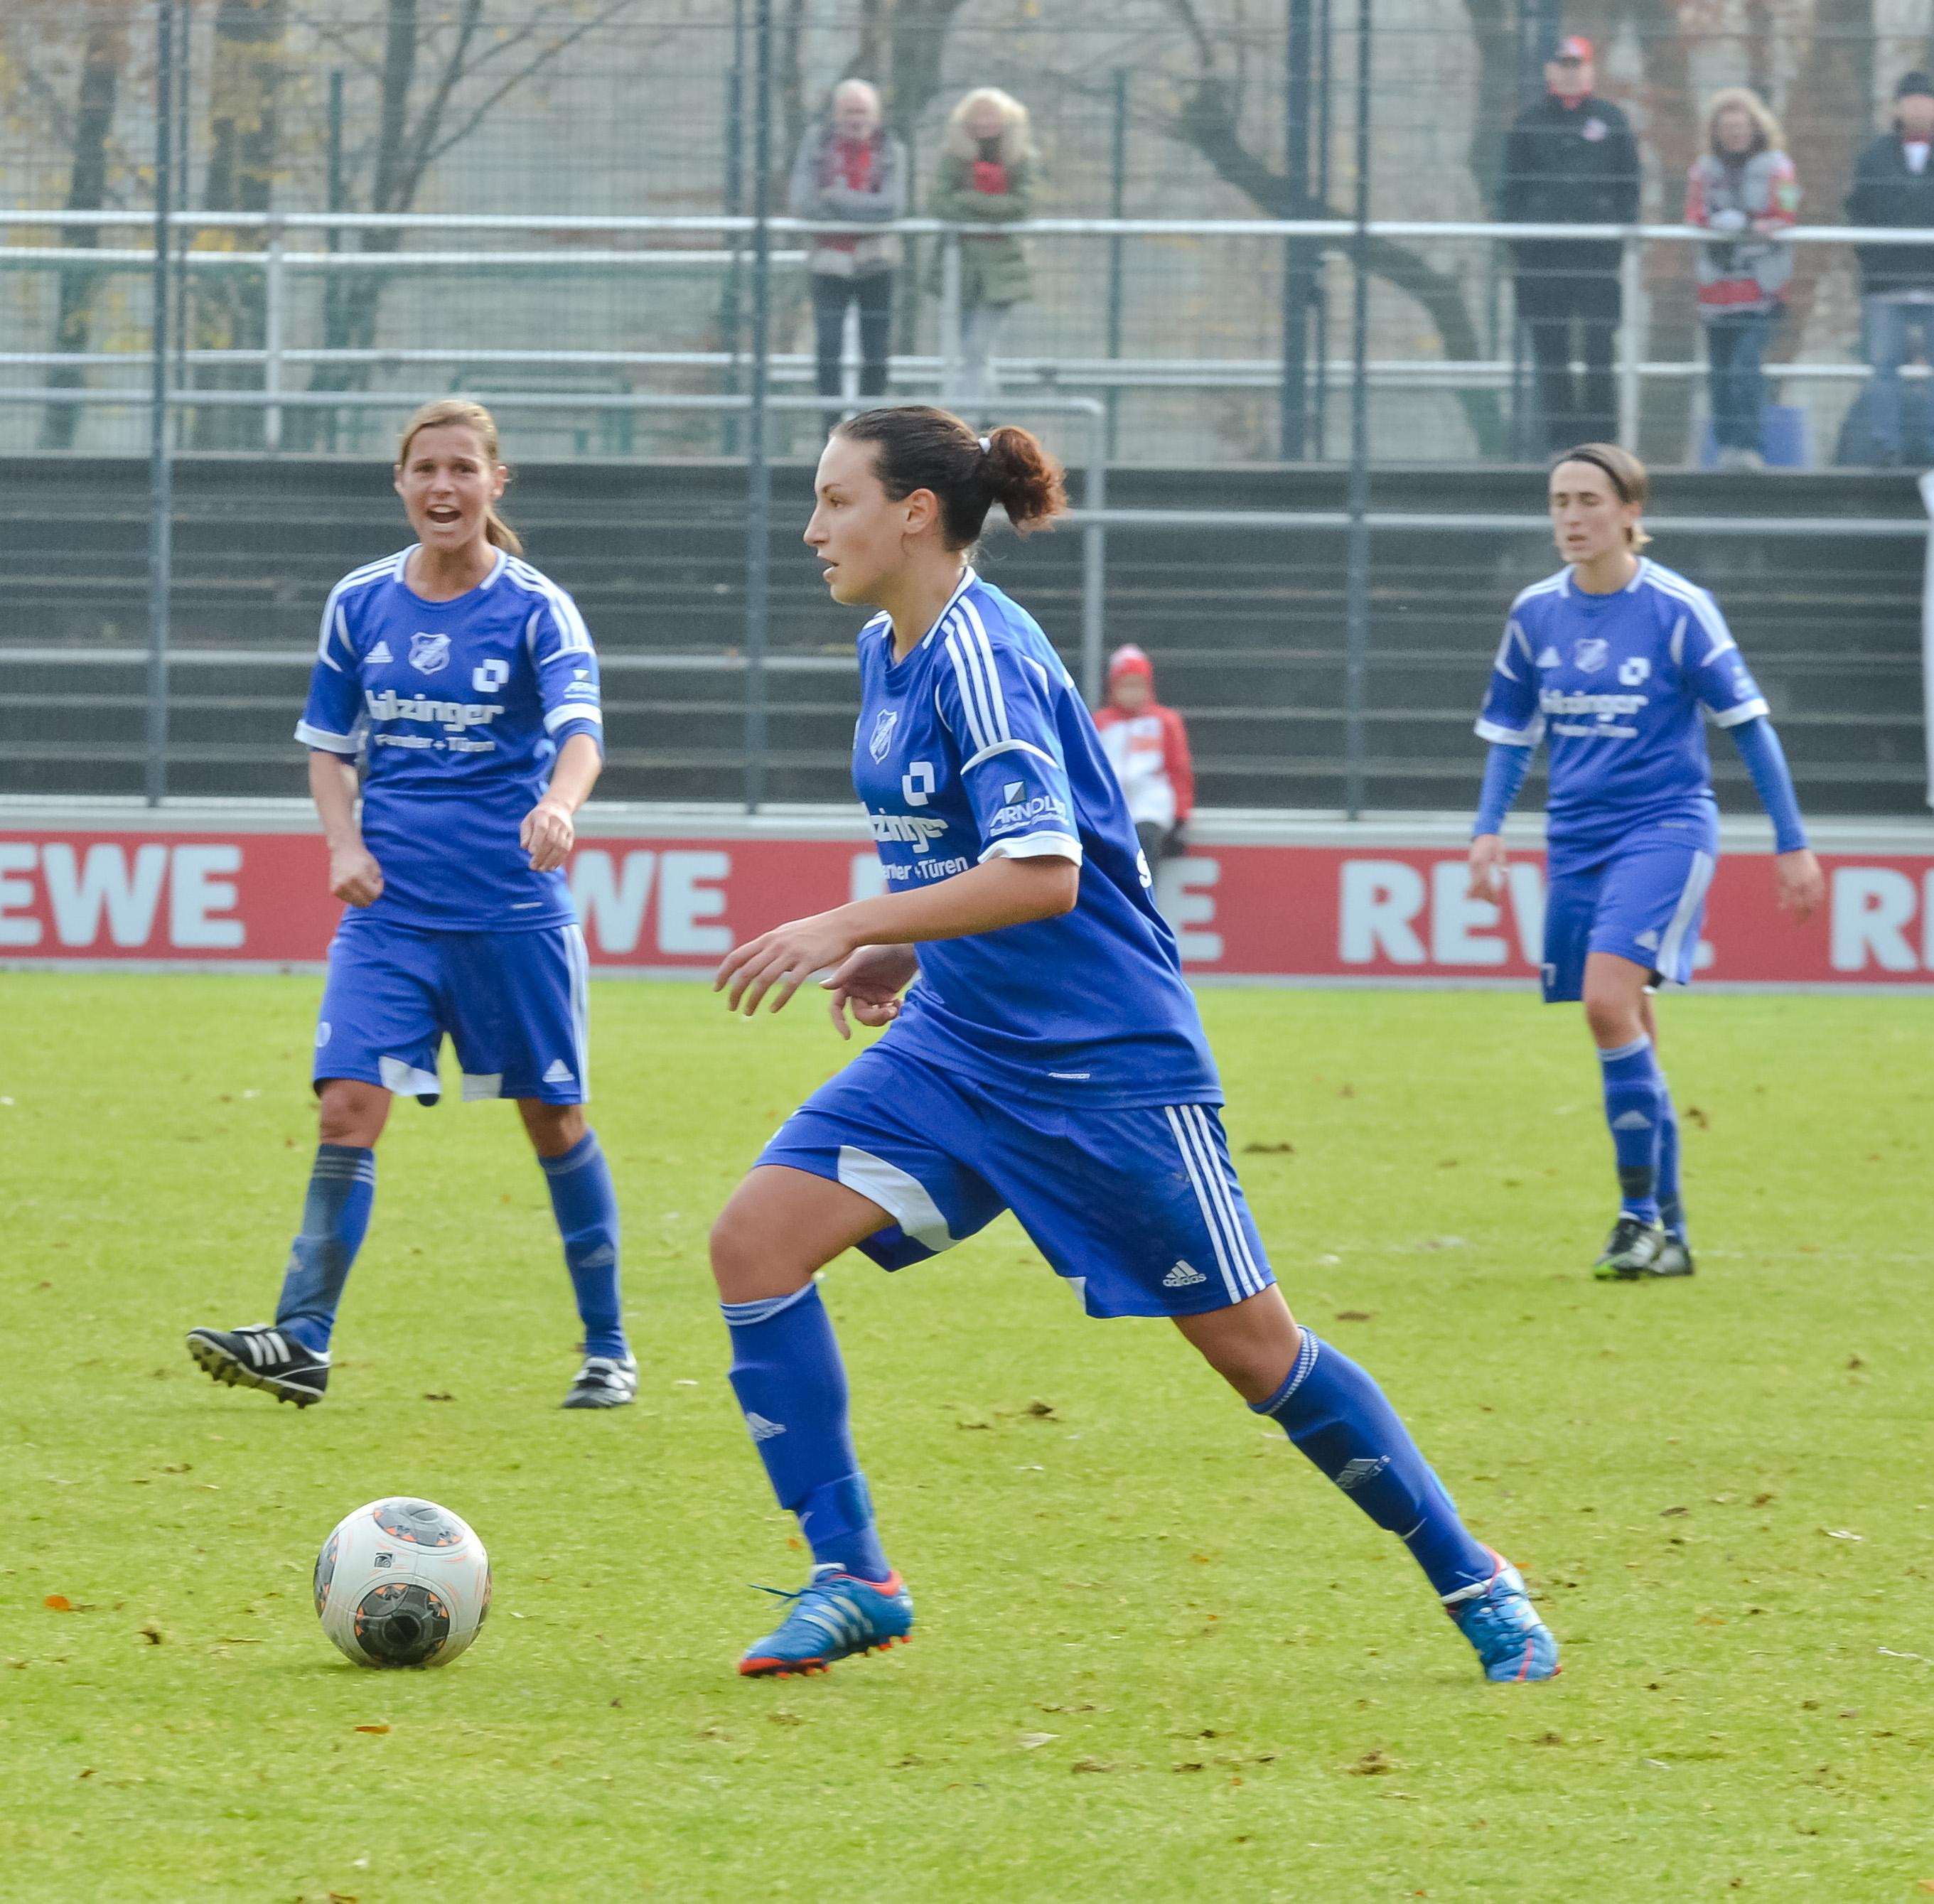 frauenfußball 2. liga